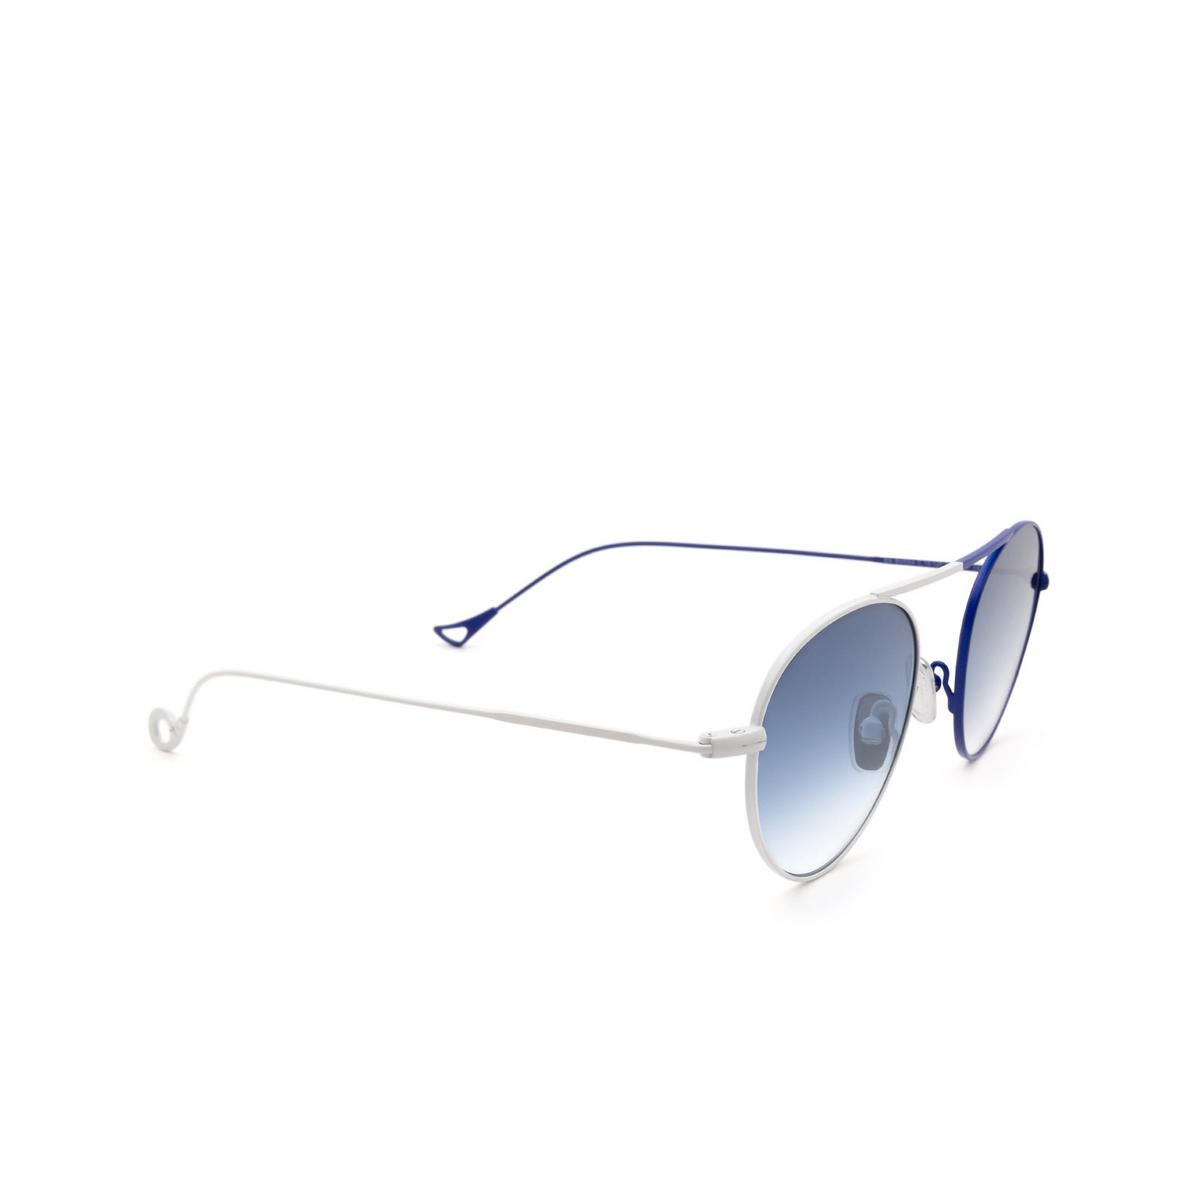 Eyepetizer® Round Sunglasses: En Bossa color White & Blue C.19-12F - three-quarters view.